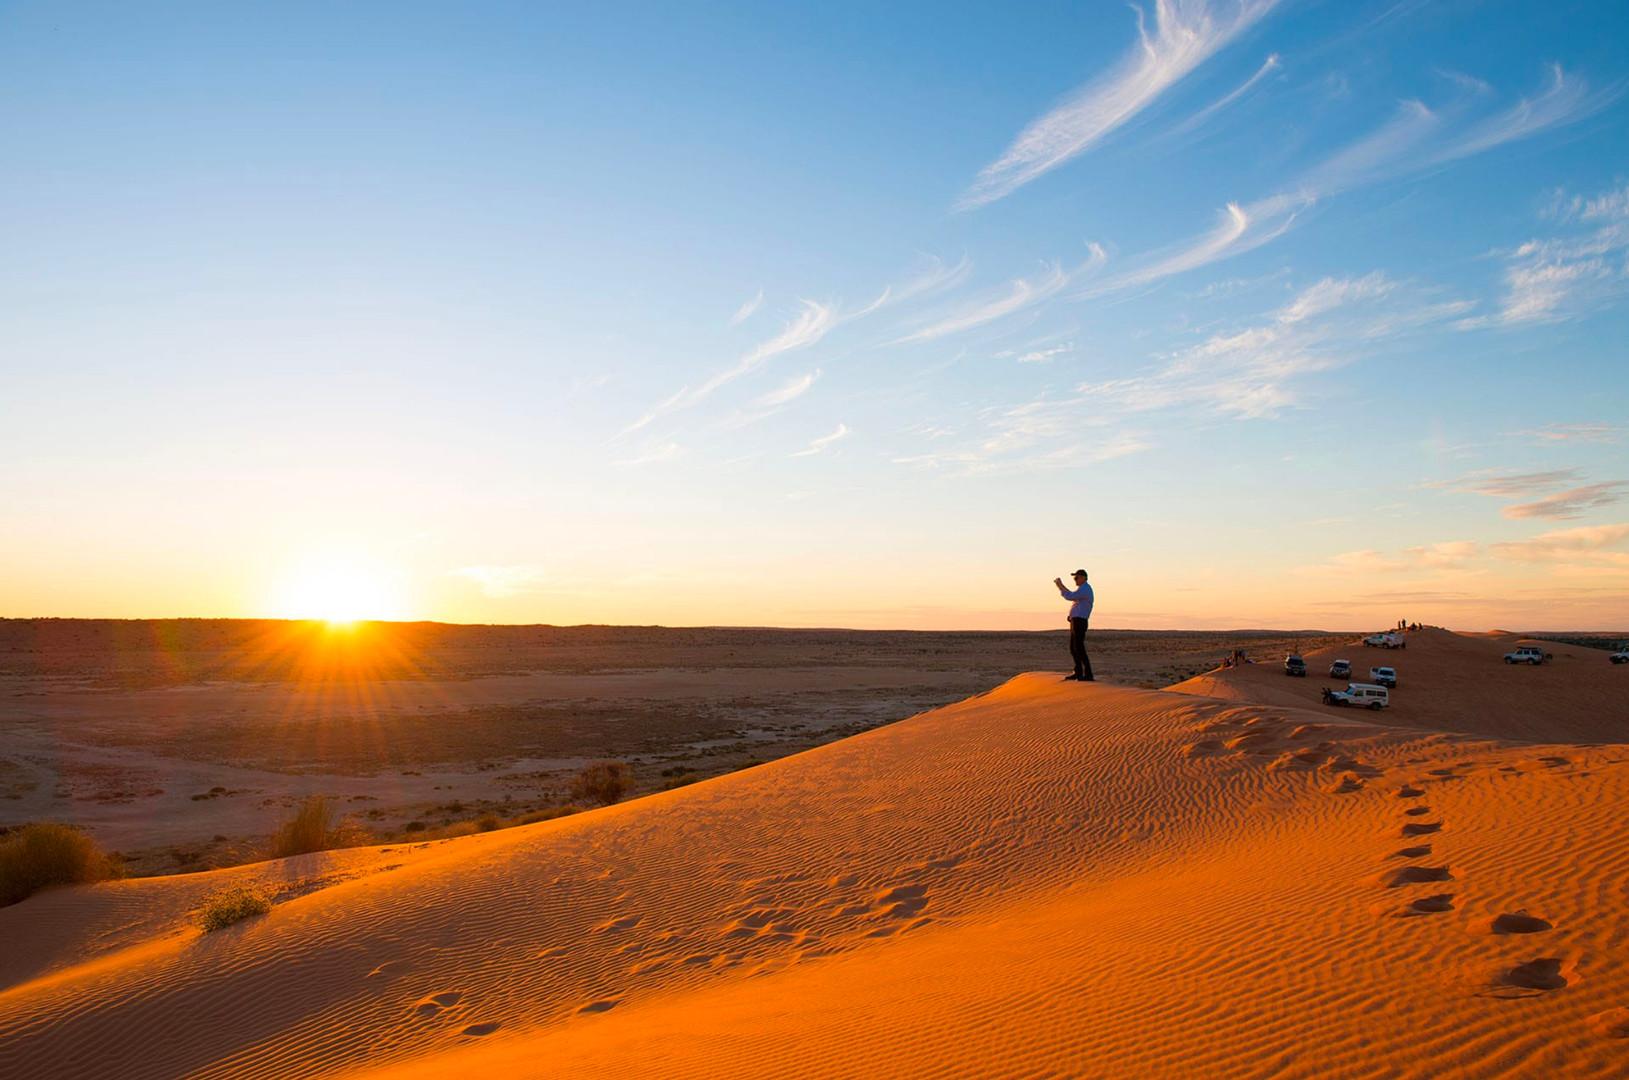 'Big Red' Simpson Desert